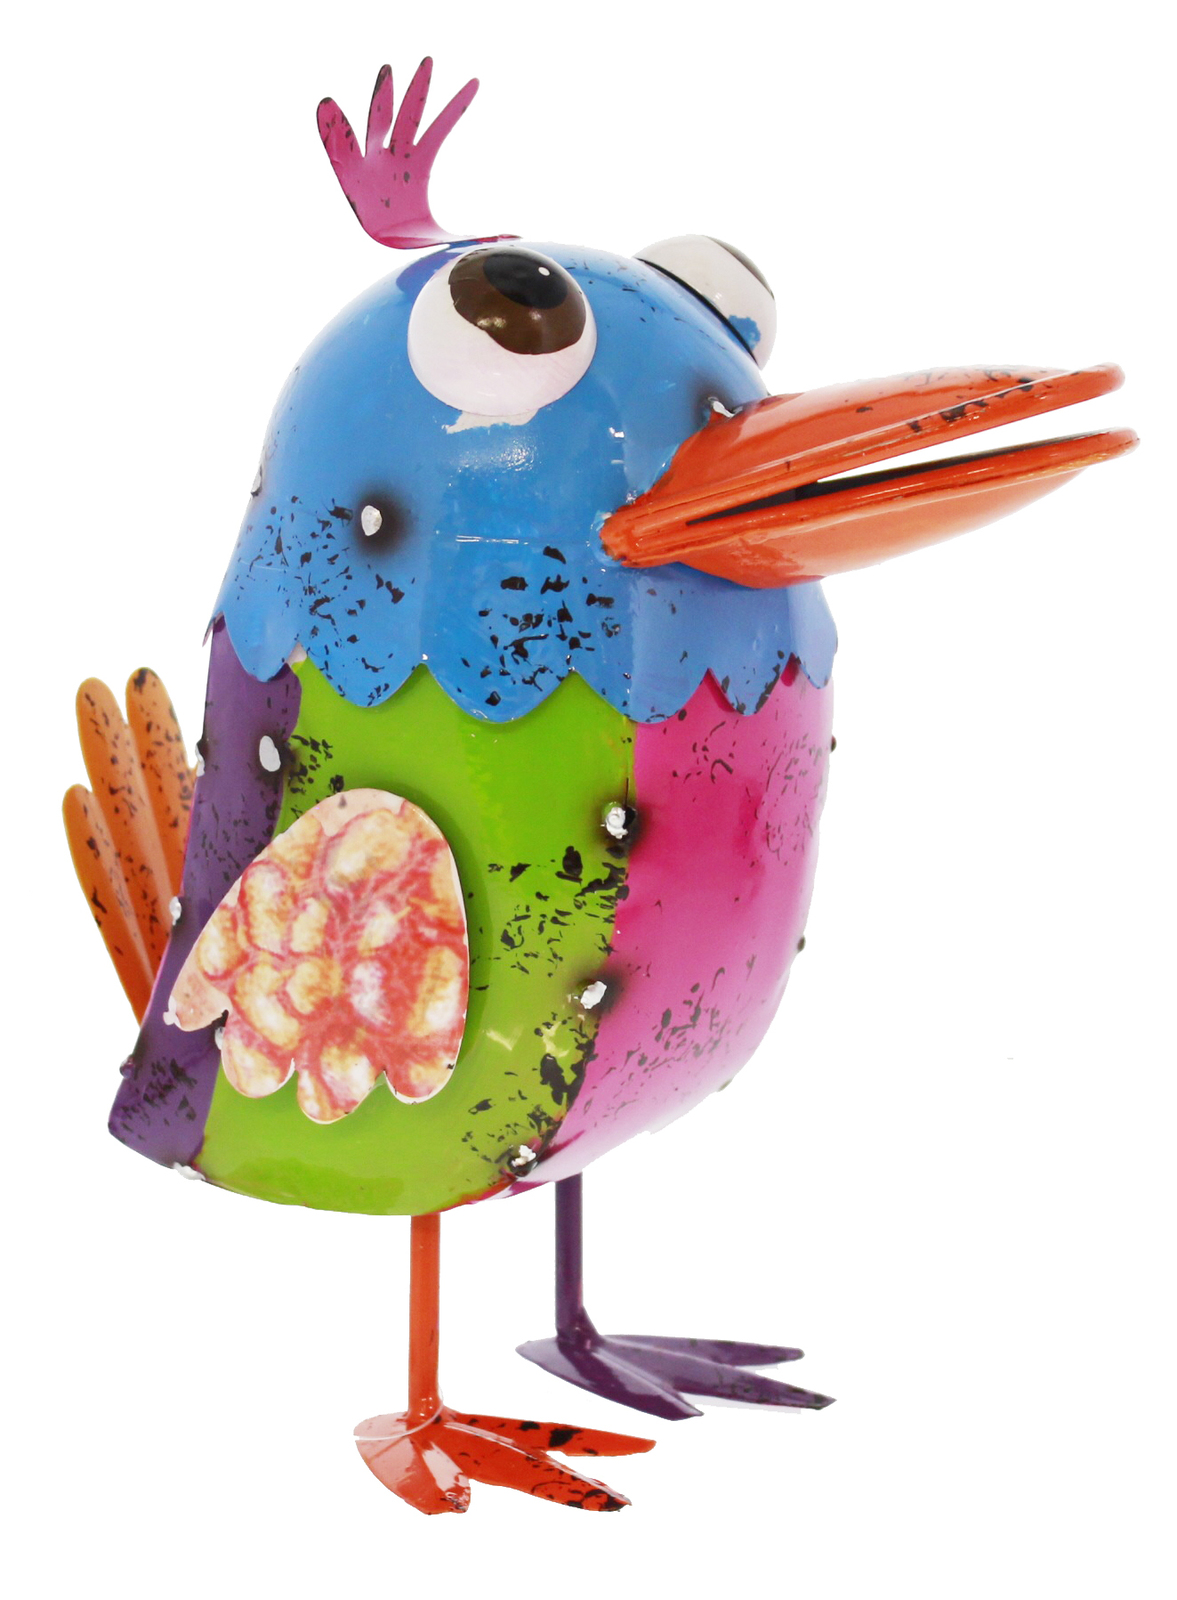 Cheeky metal animal ornament bicky bird at mighty ape nz